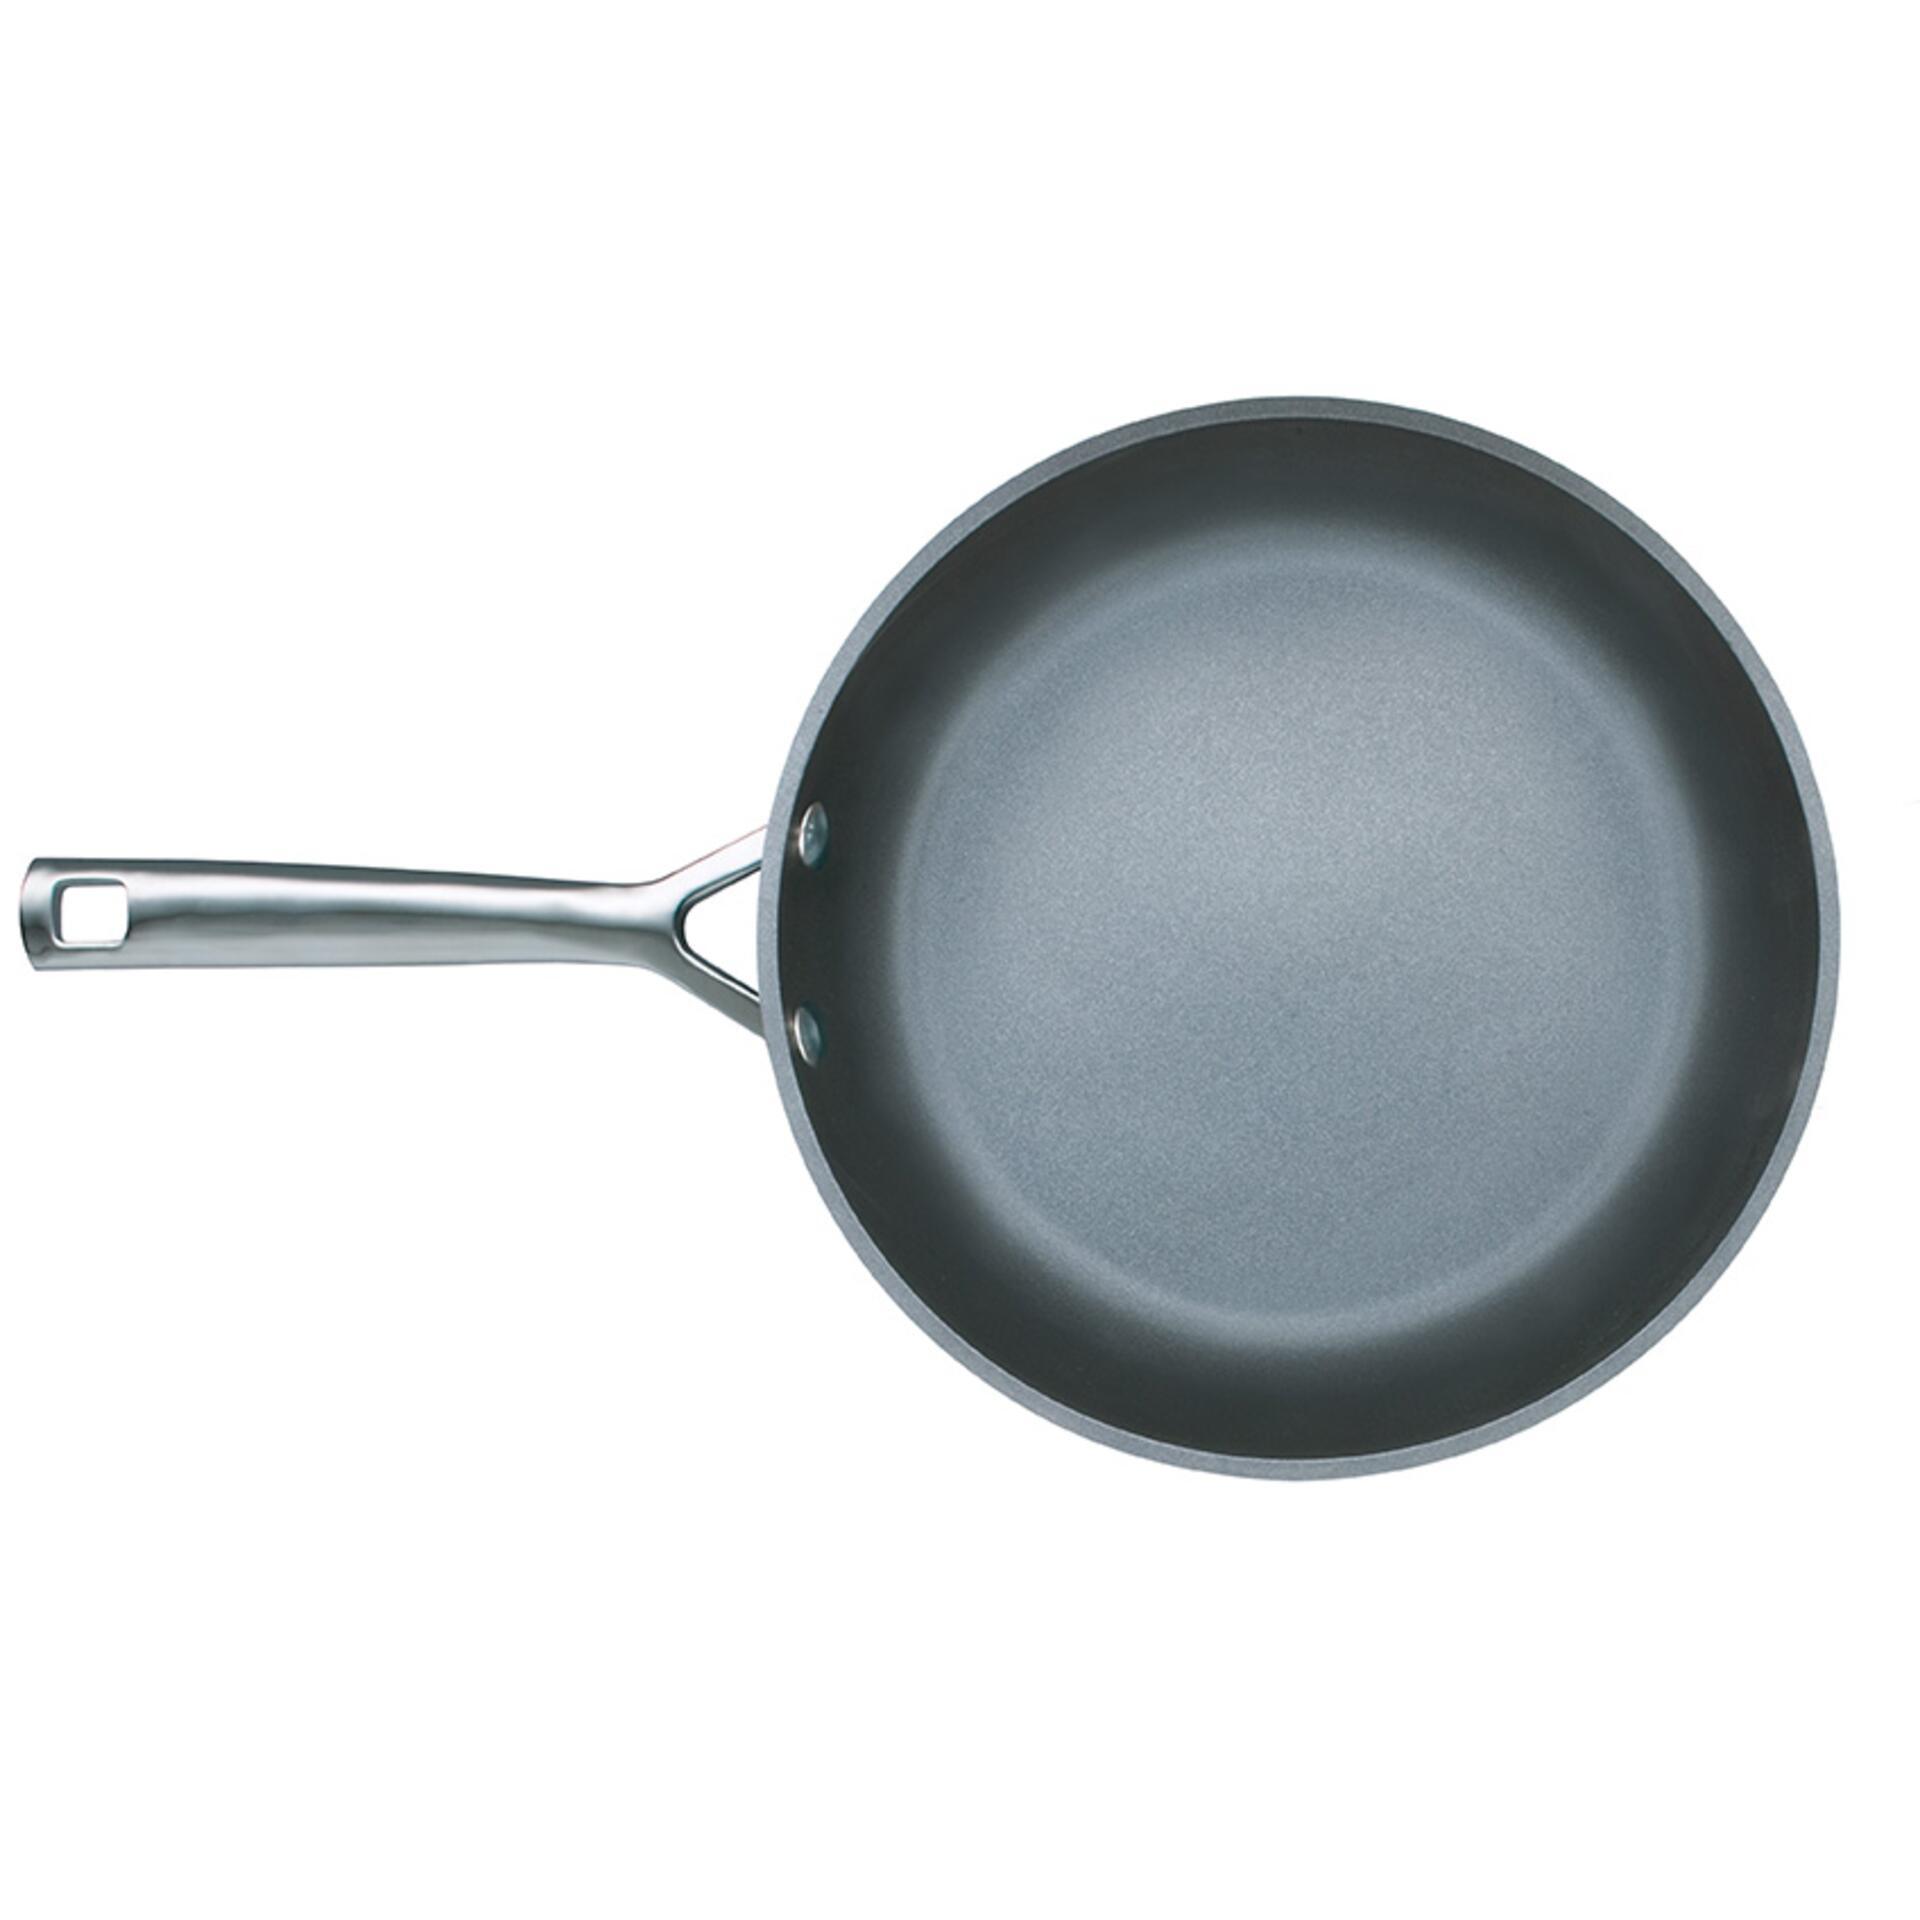 Le Creuset Alu Pfanne Flach 20 cm